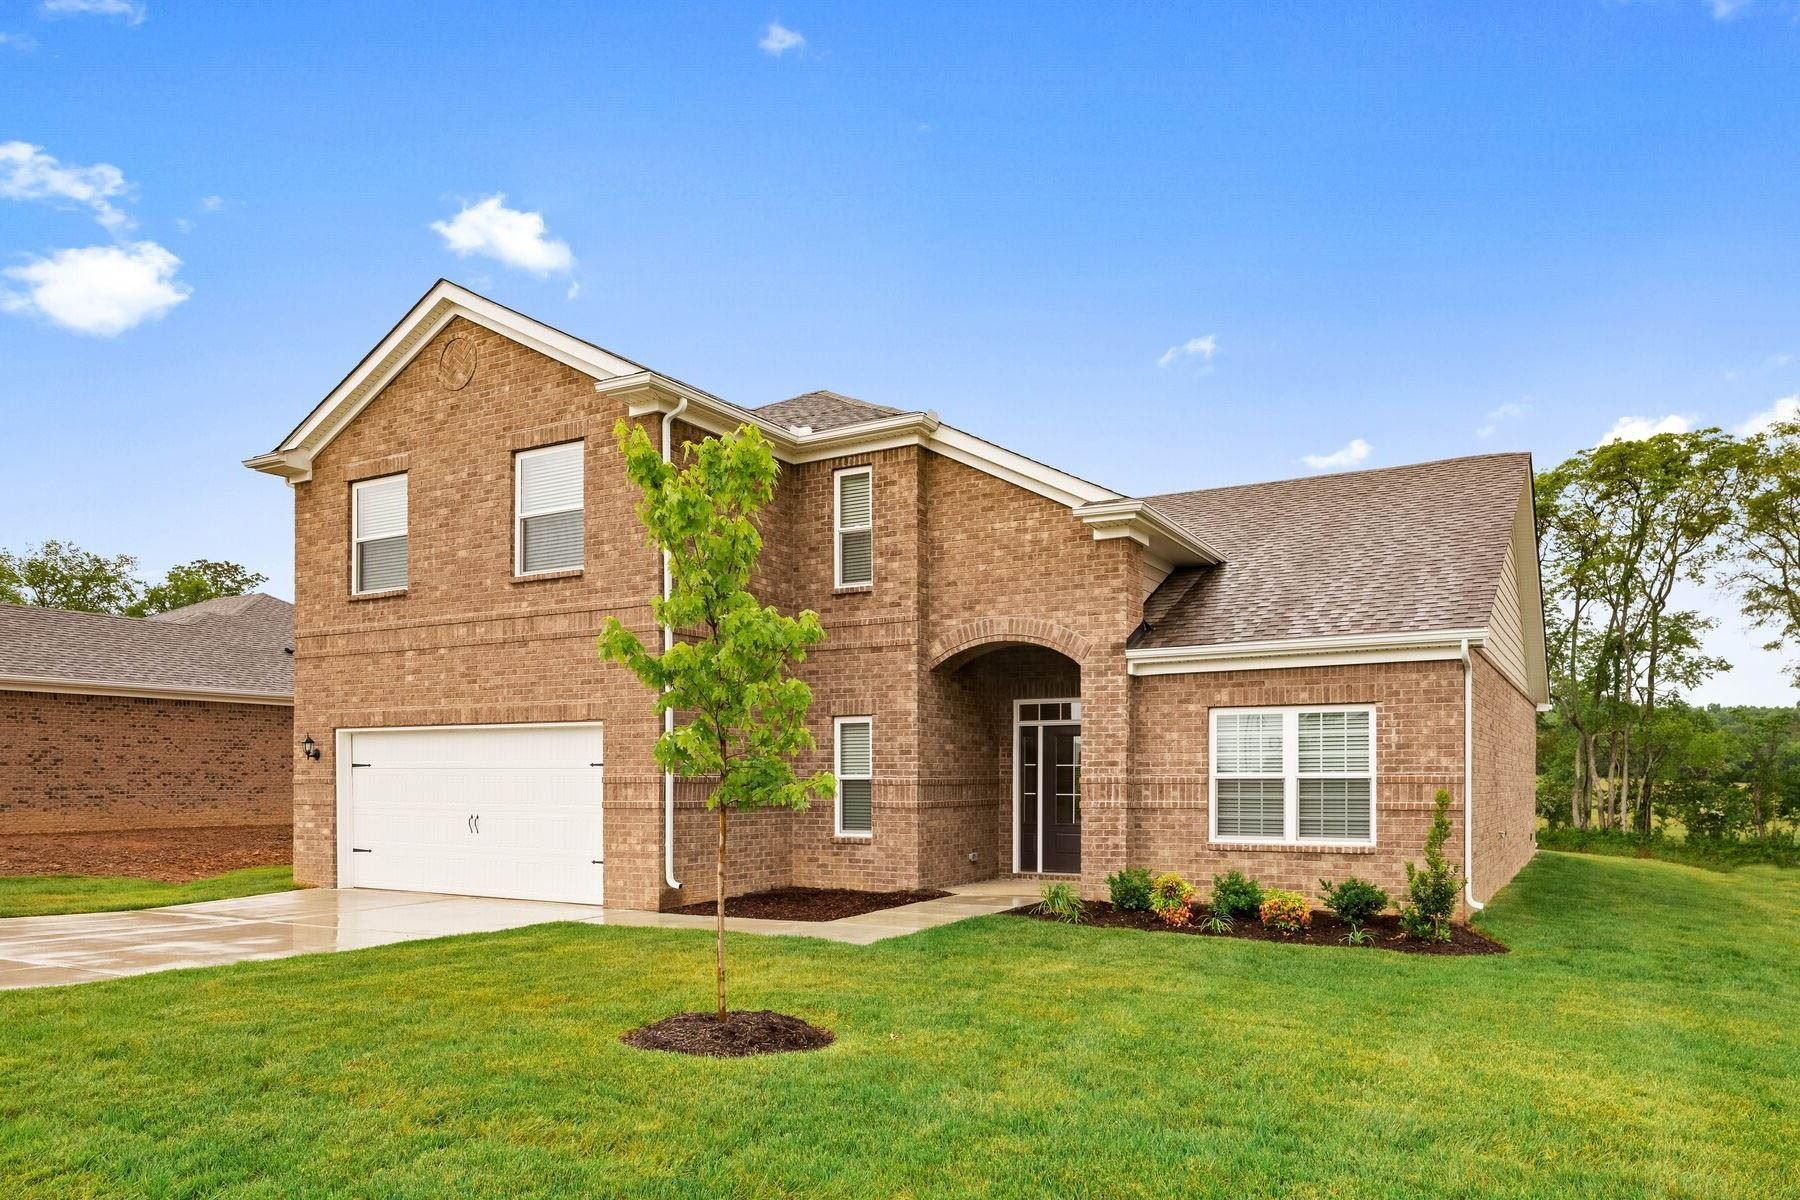 569 Fredericksburg Drive, Gallatin, TN 37066 - MLS#: 2159417